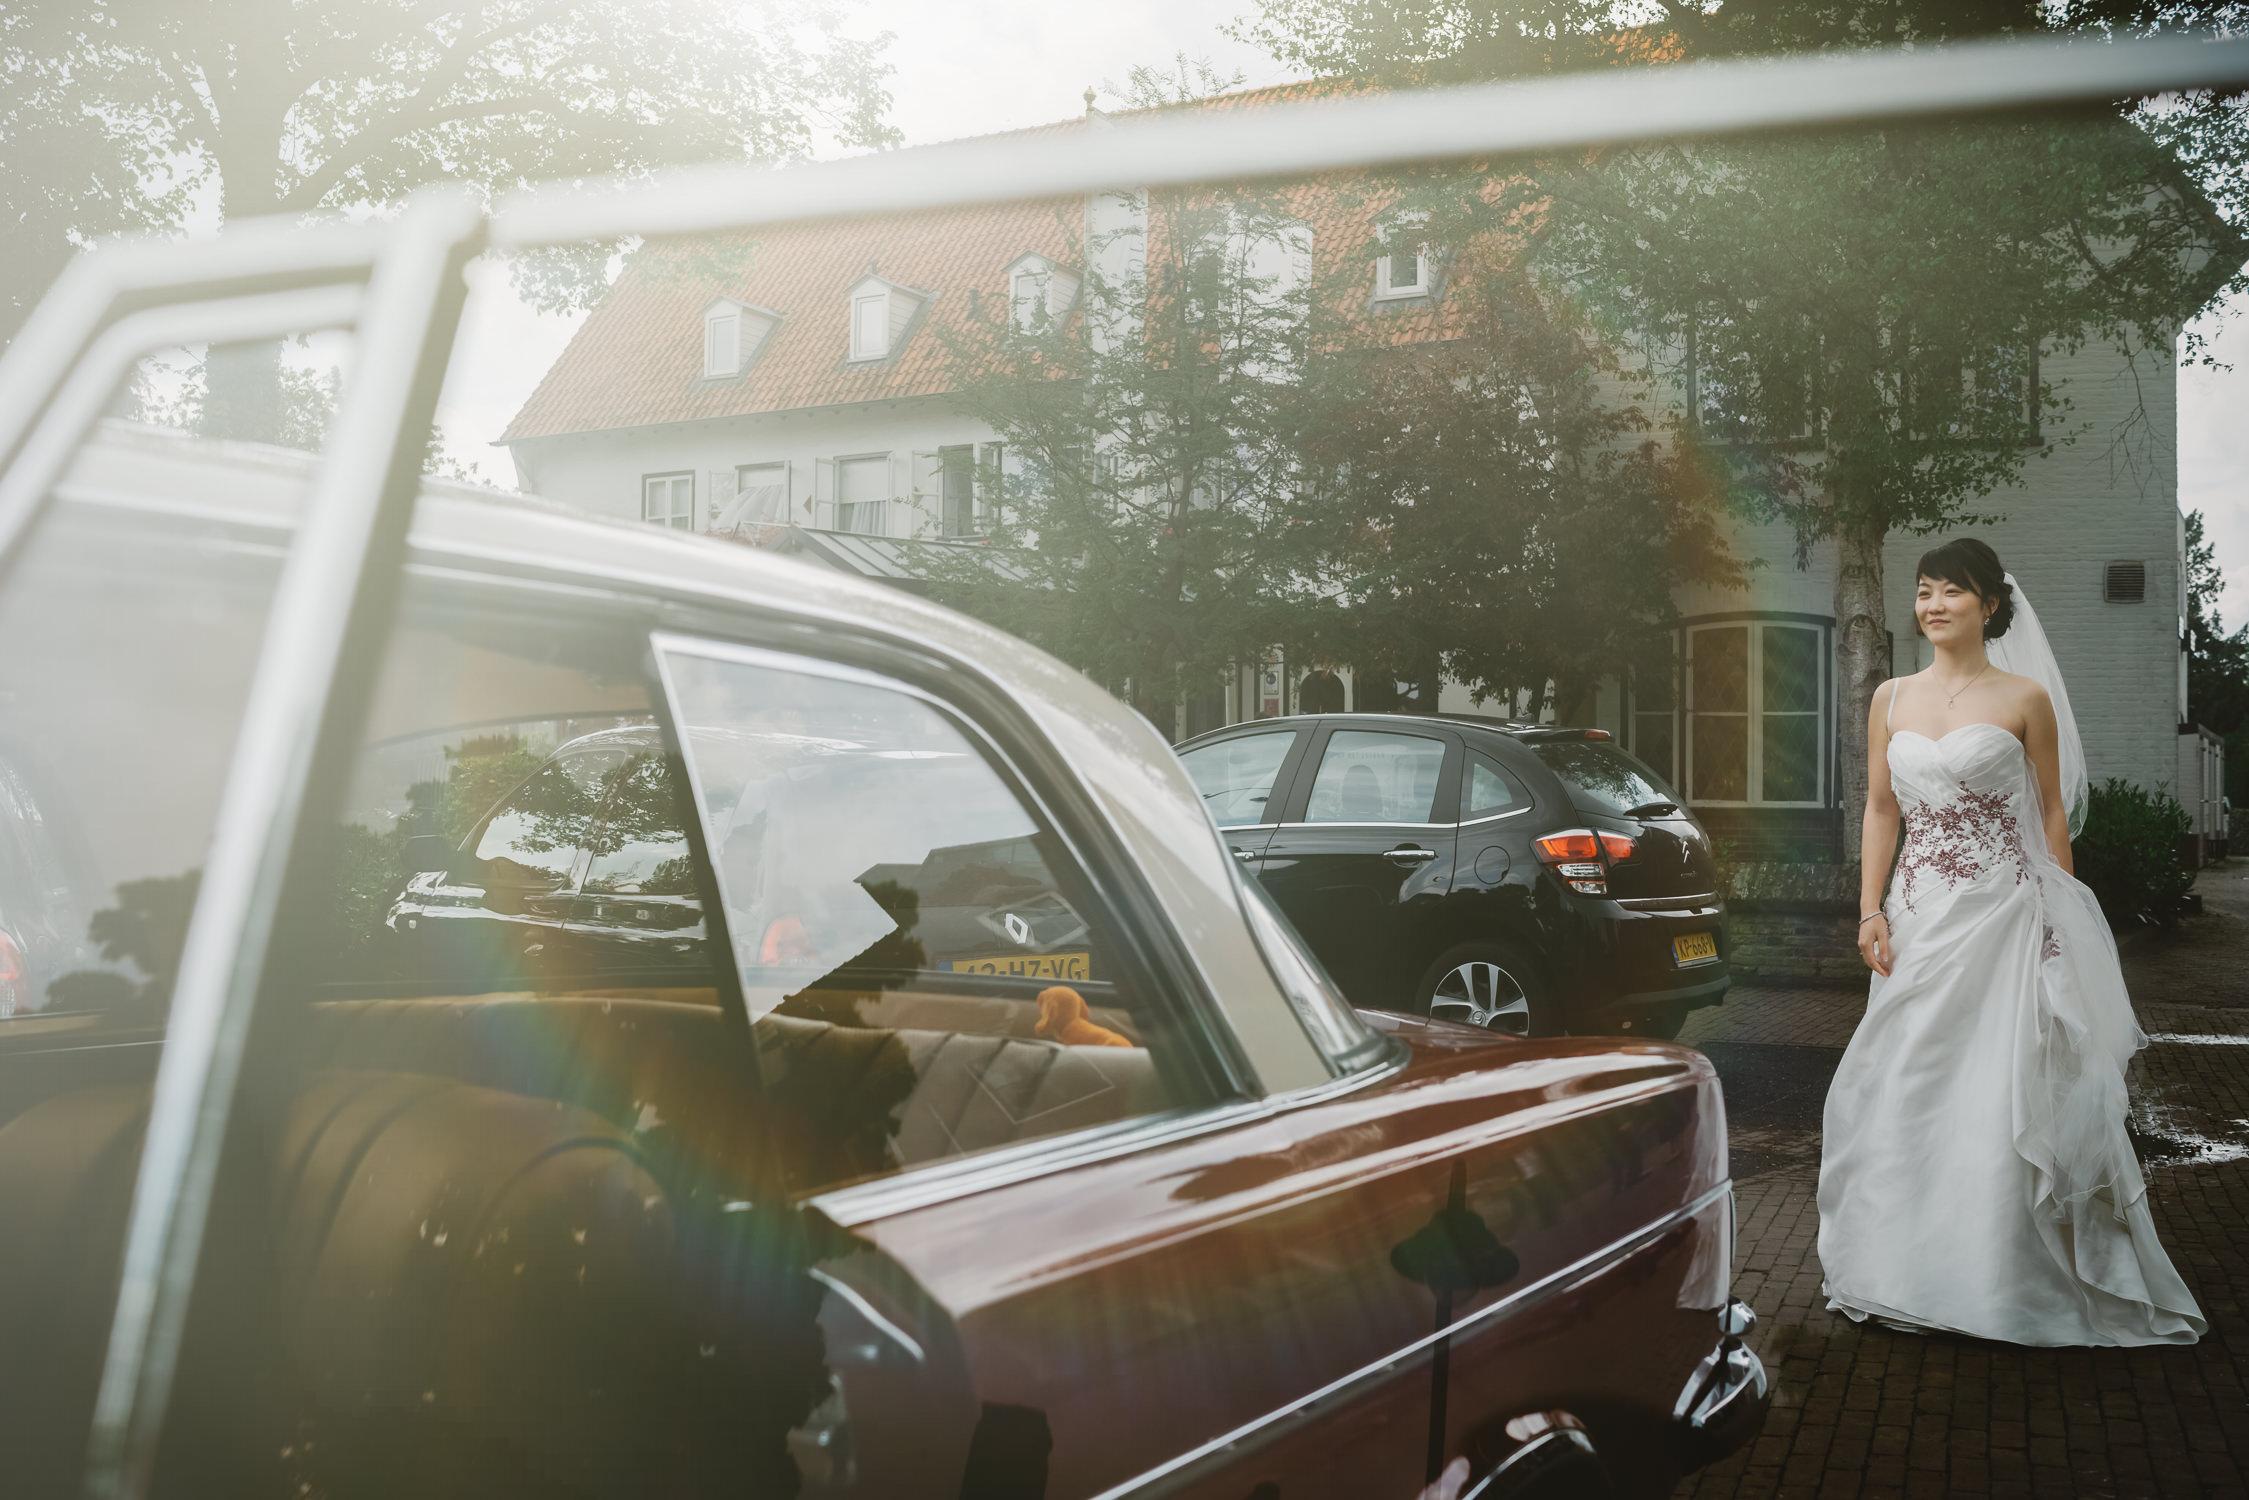 bruidsfotografie-amsterdam-utrecht-trouwfotograaf-mark-hadden-wedding-photography-Yun & Geert-037-3.jpg